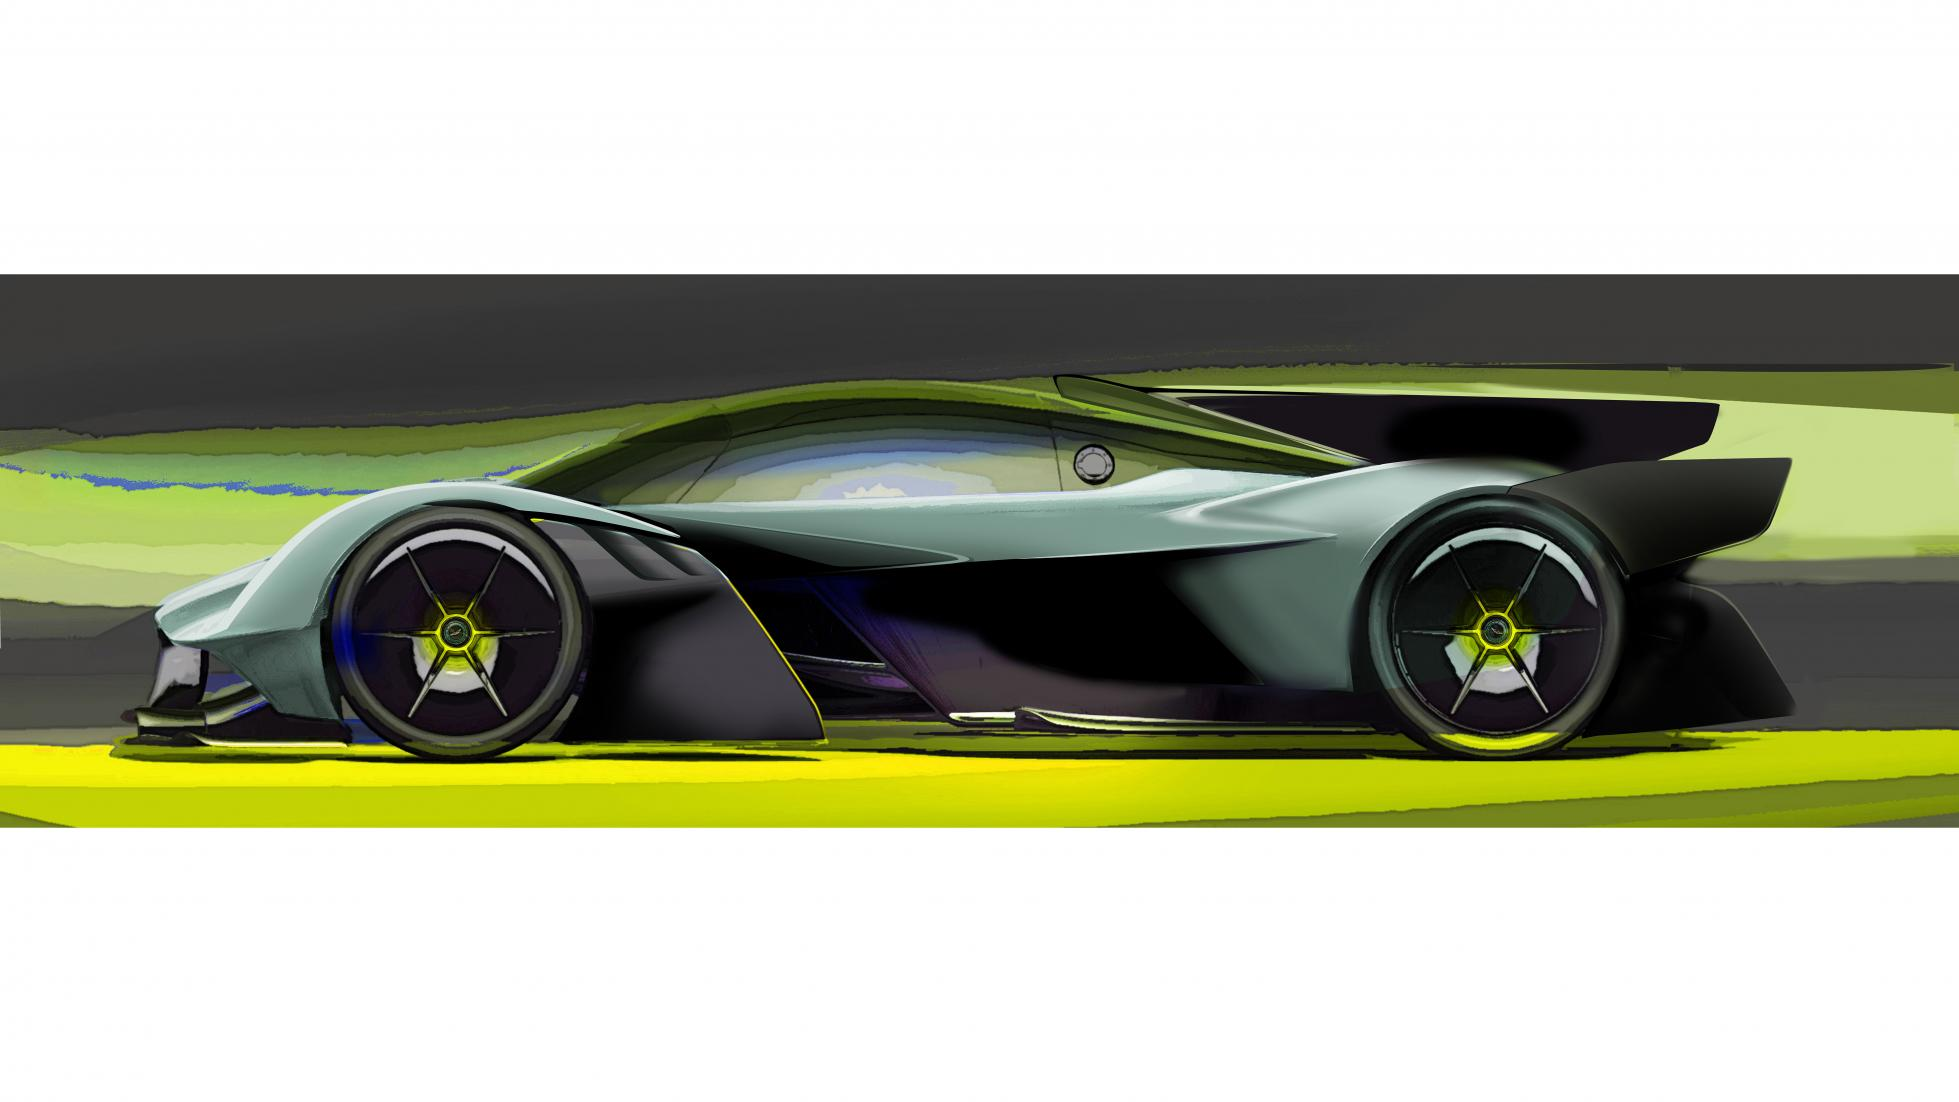 Red Bull Racing F1 Driver Daniel Ricciardo Orders An Aston Martin